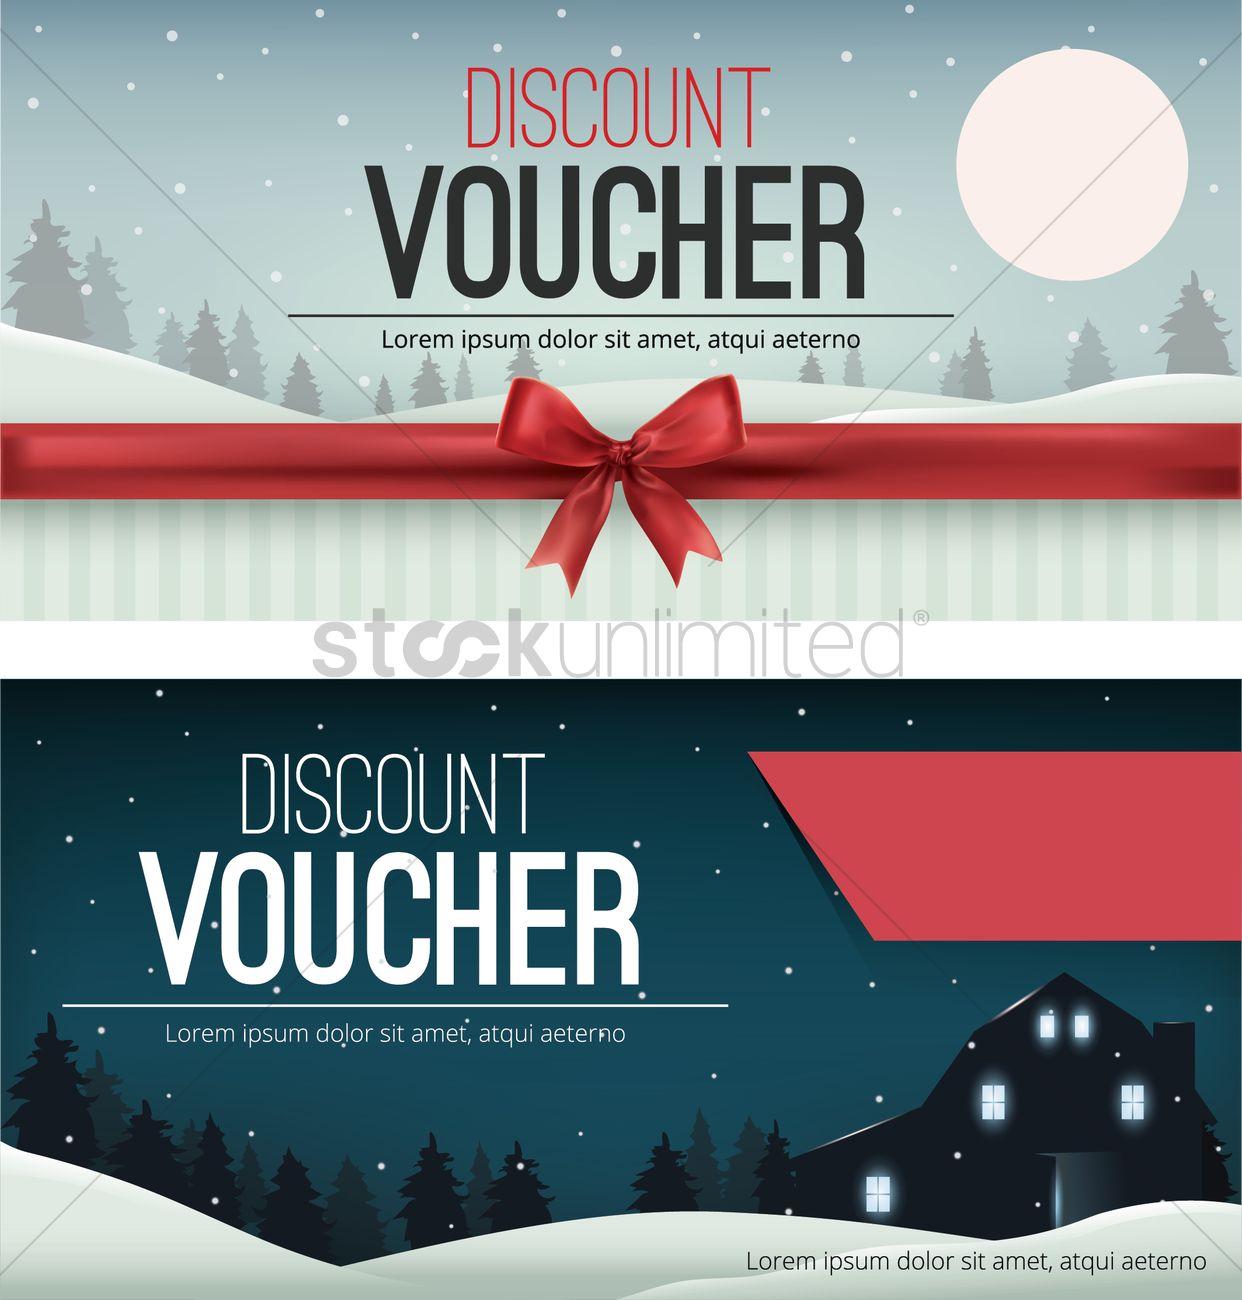 Discount voucher design Vector Image 2022156 – Discount Voucher Design